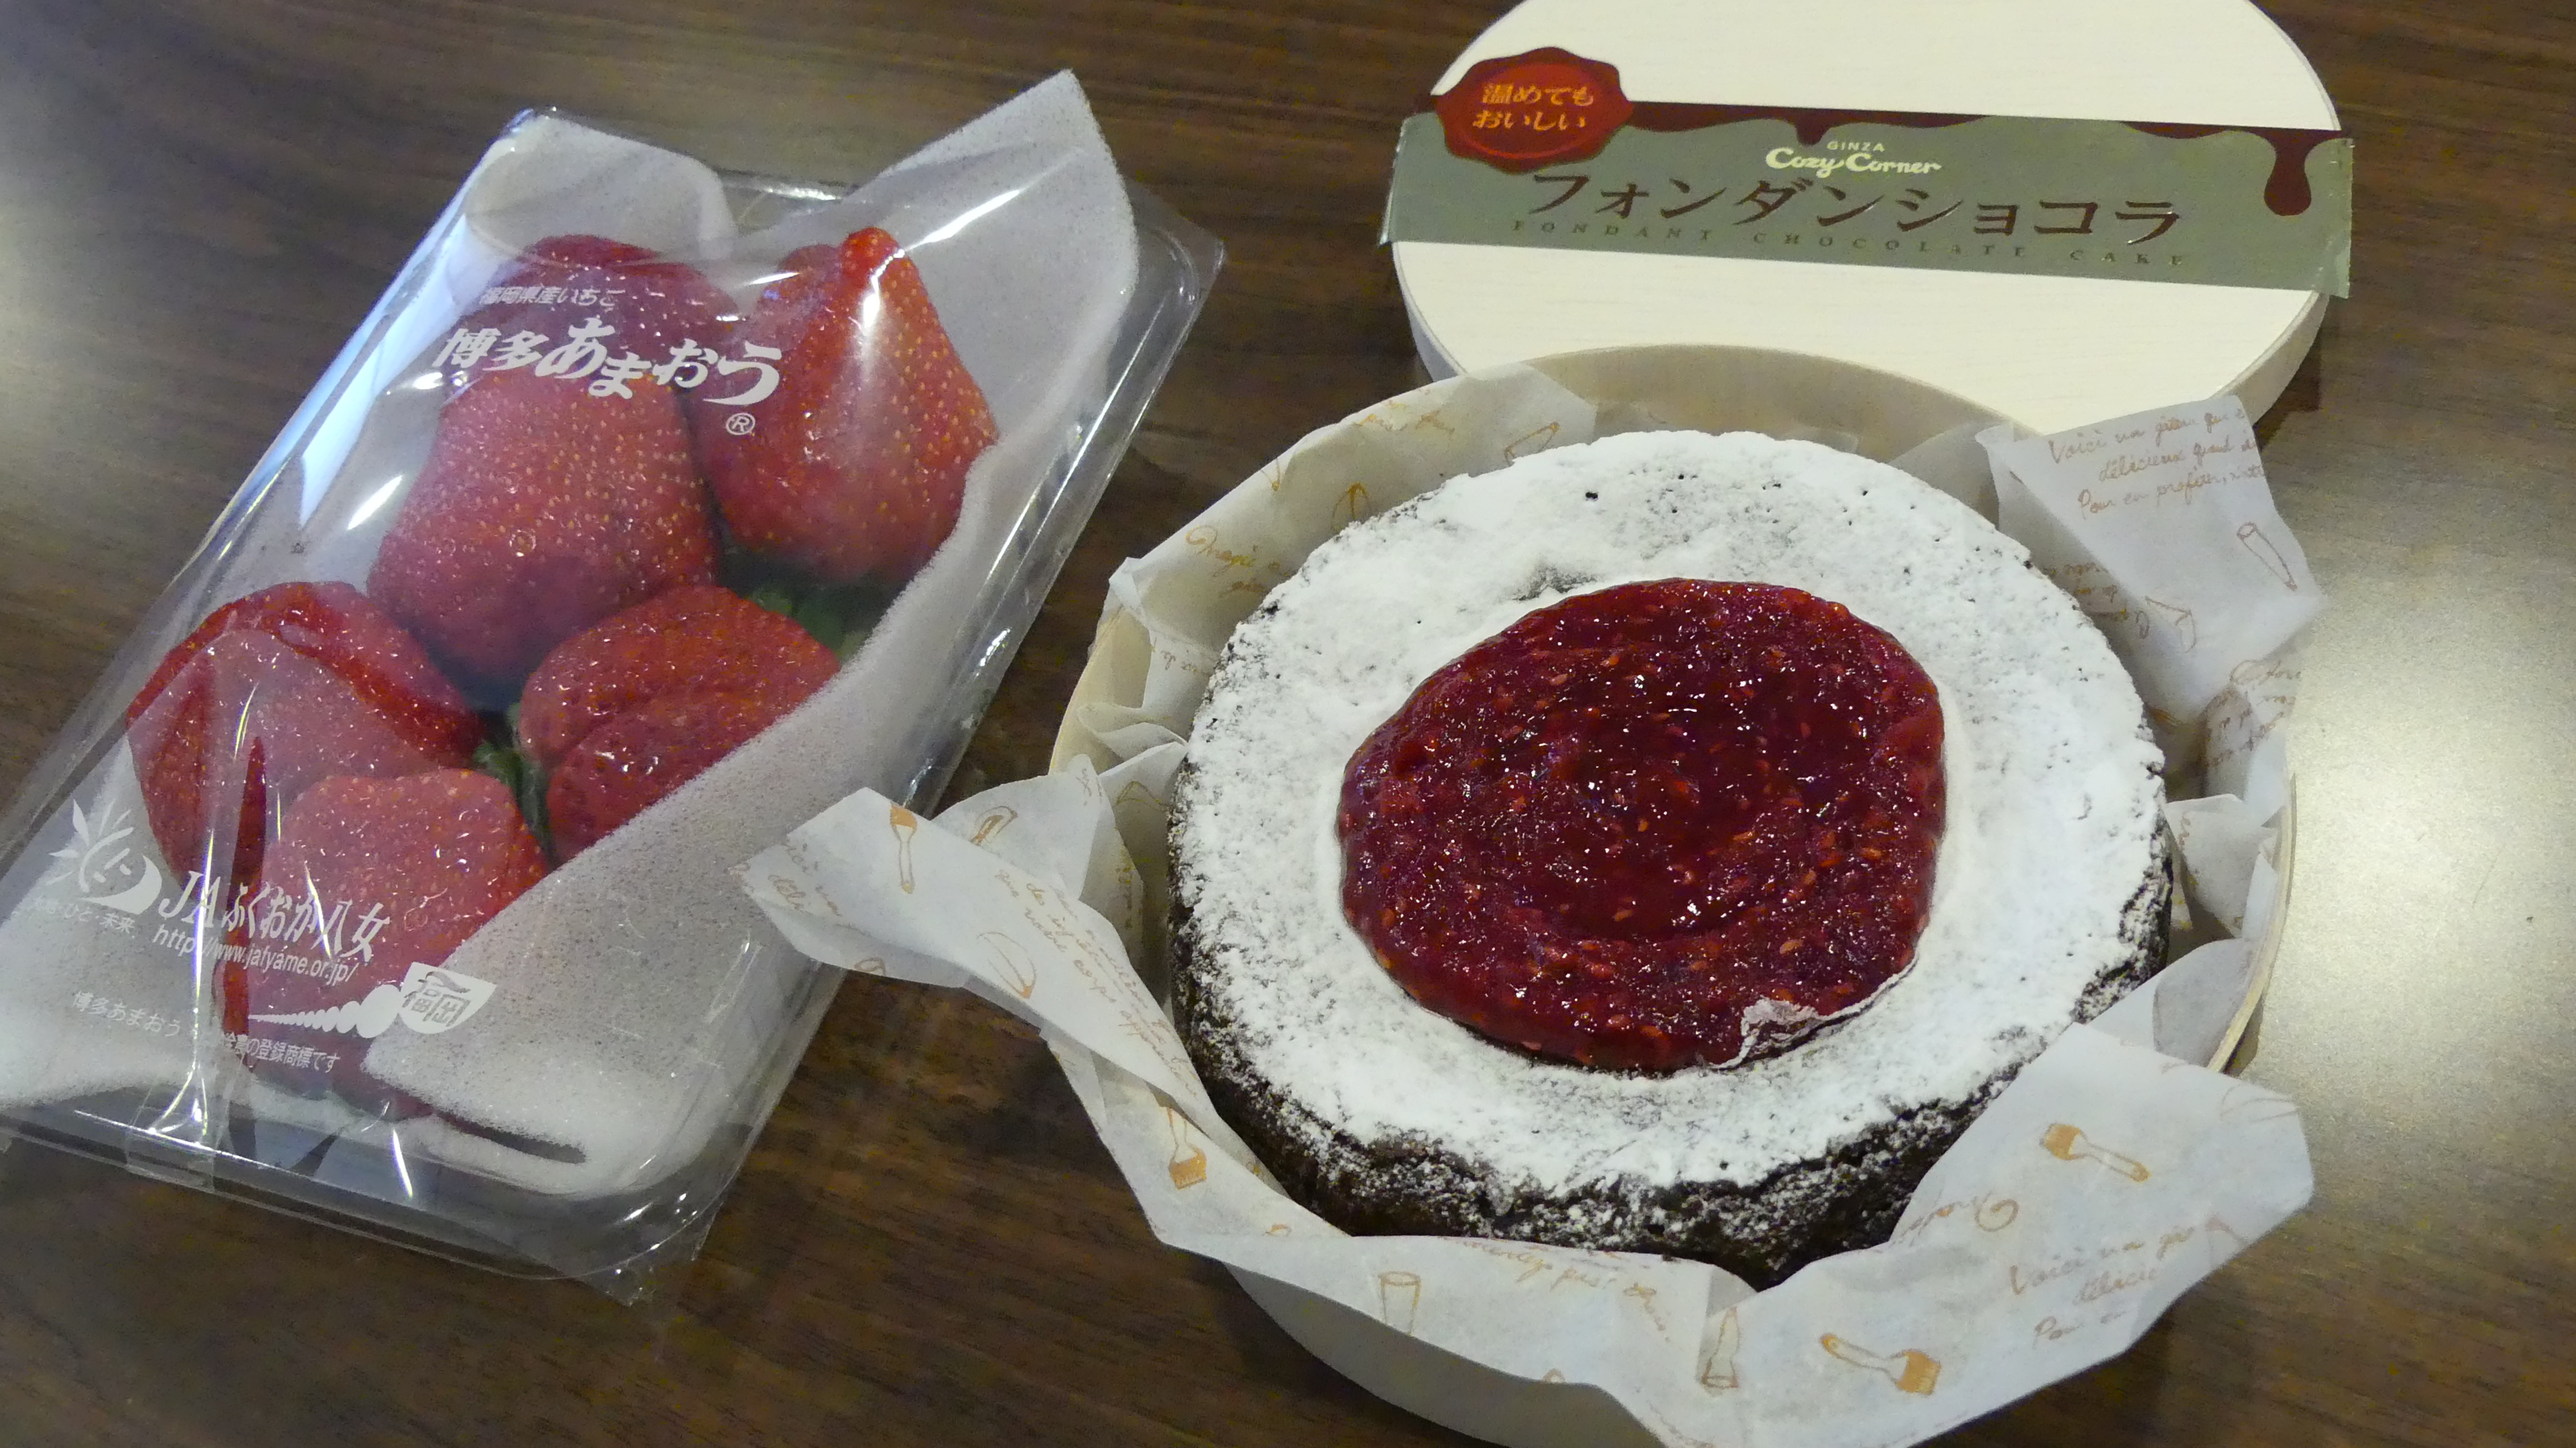 Valentine Ginza Cozy Corner Fondant Chocolate Japanese Strawberries